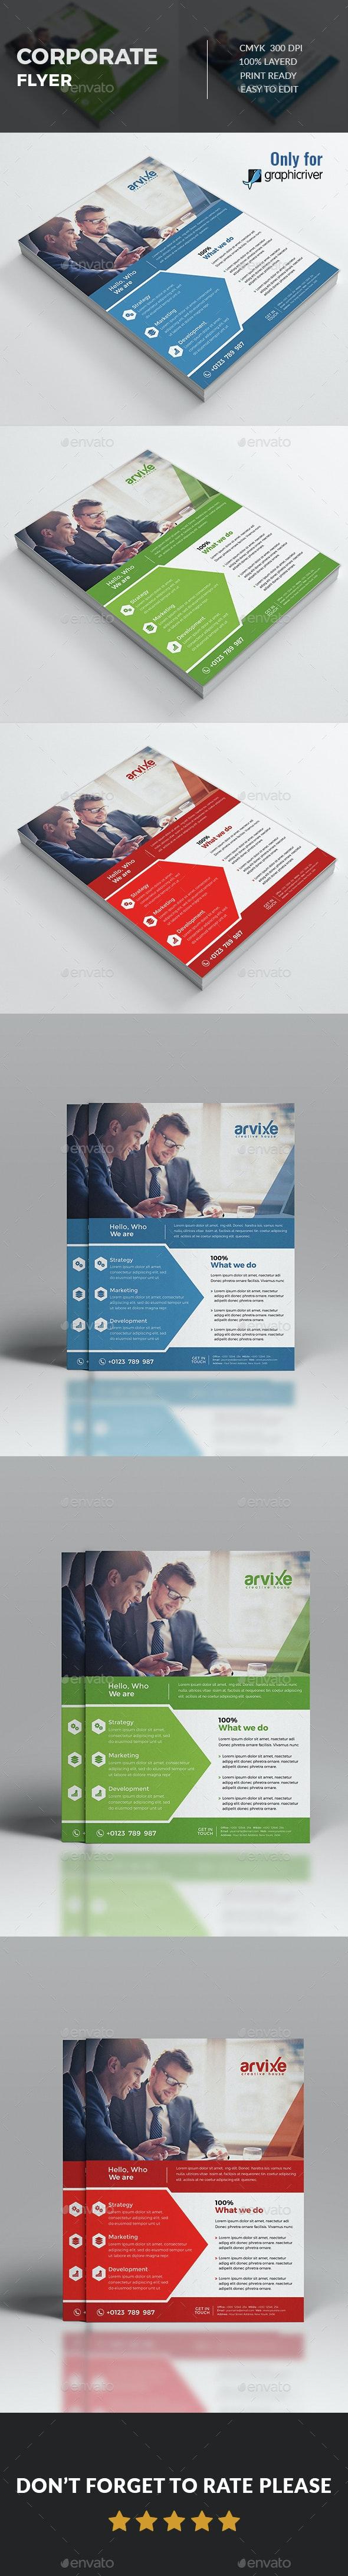 Corporate Flyer  - Corporate Flyers